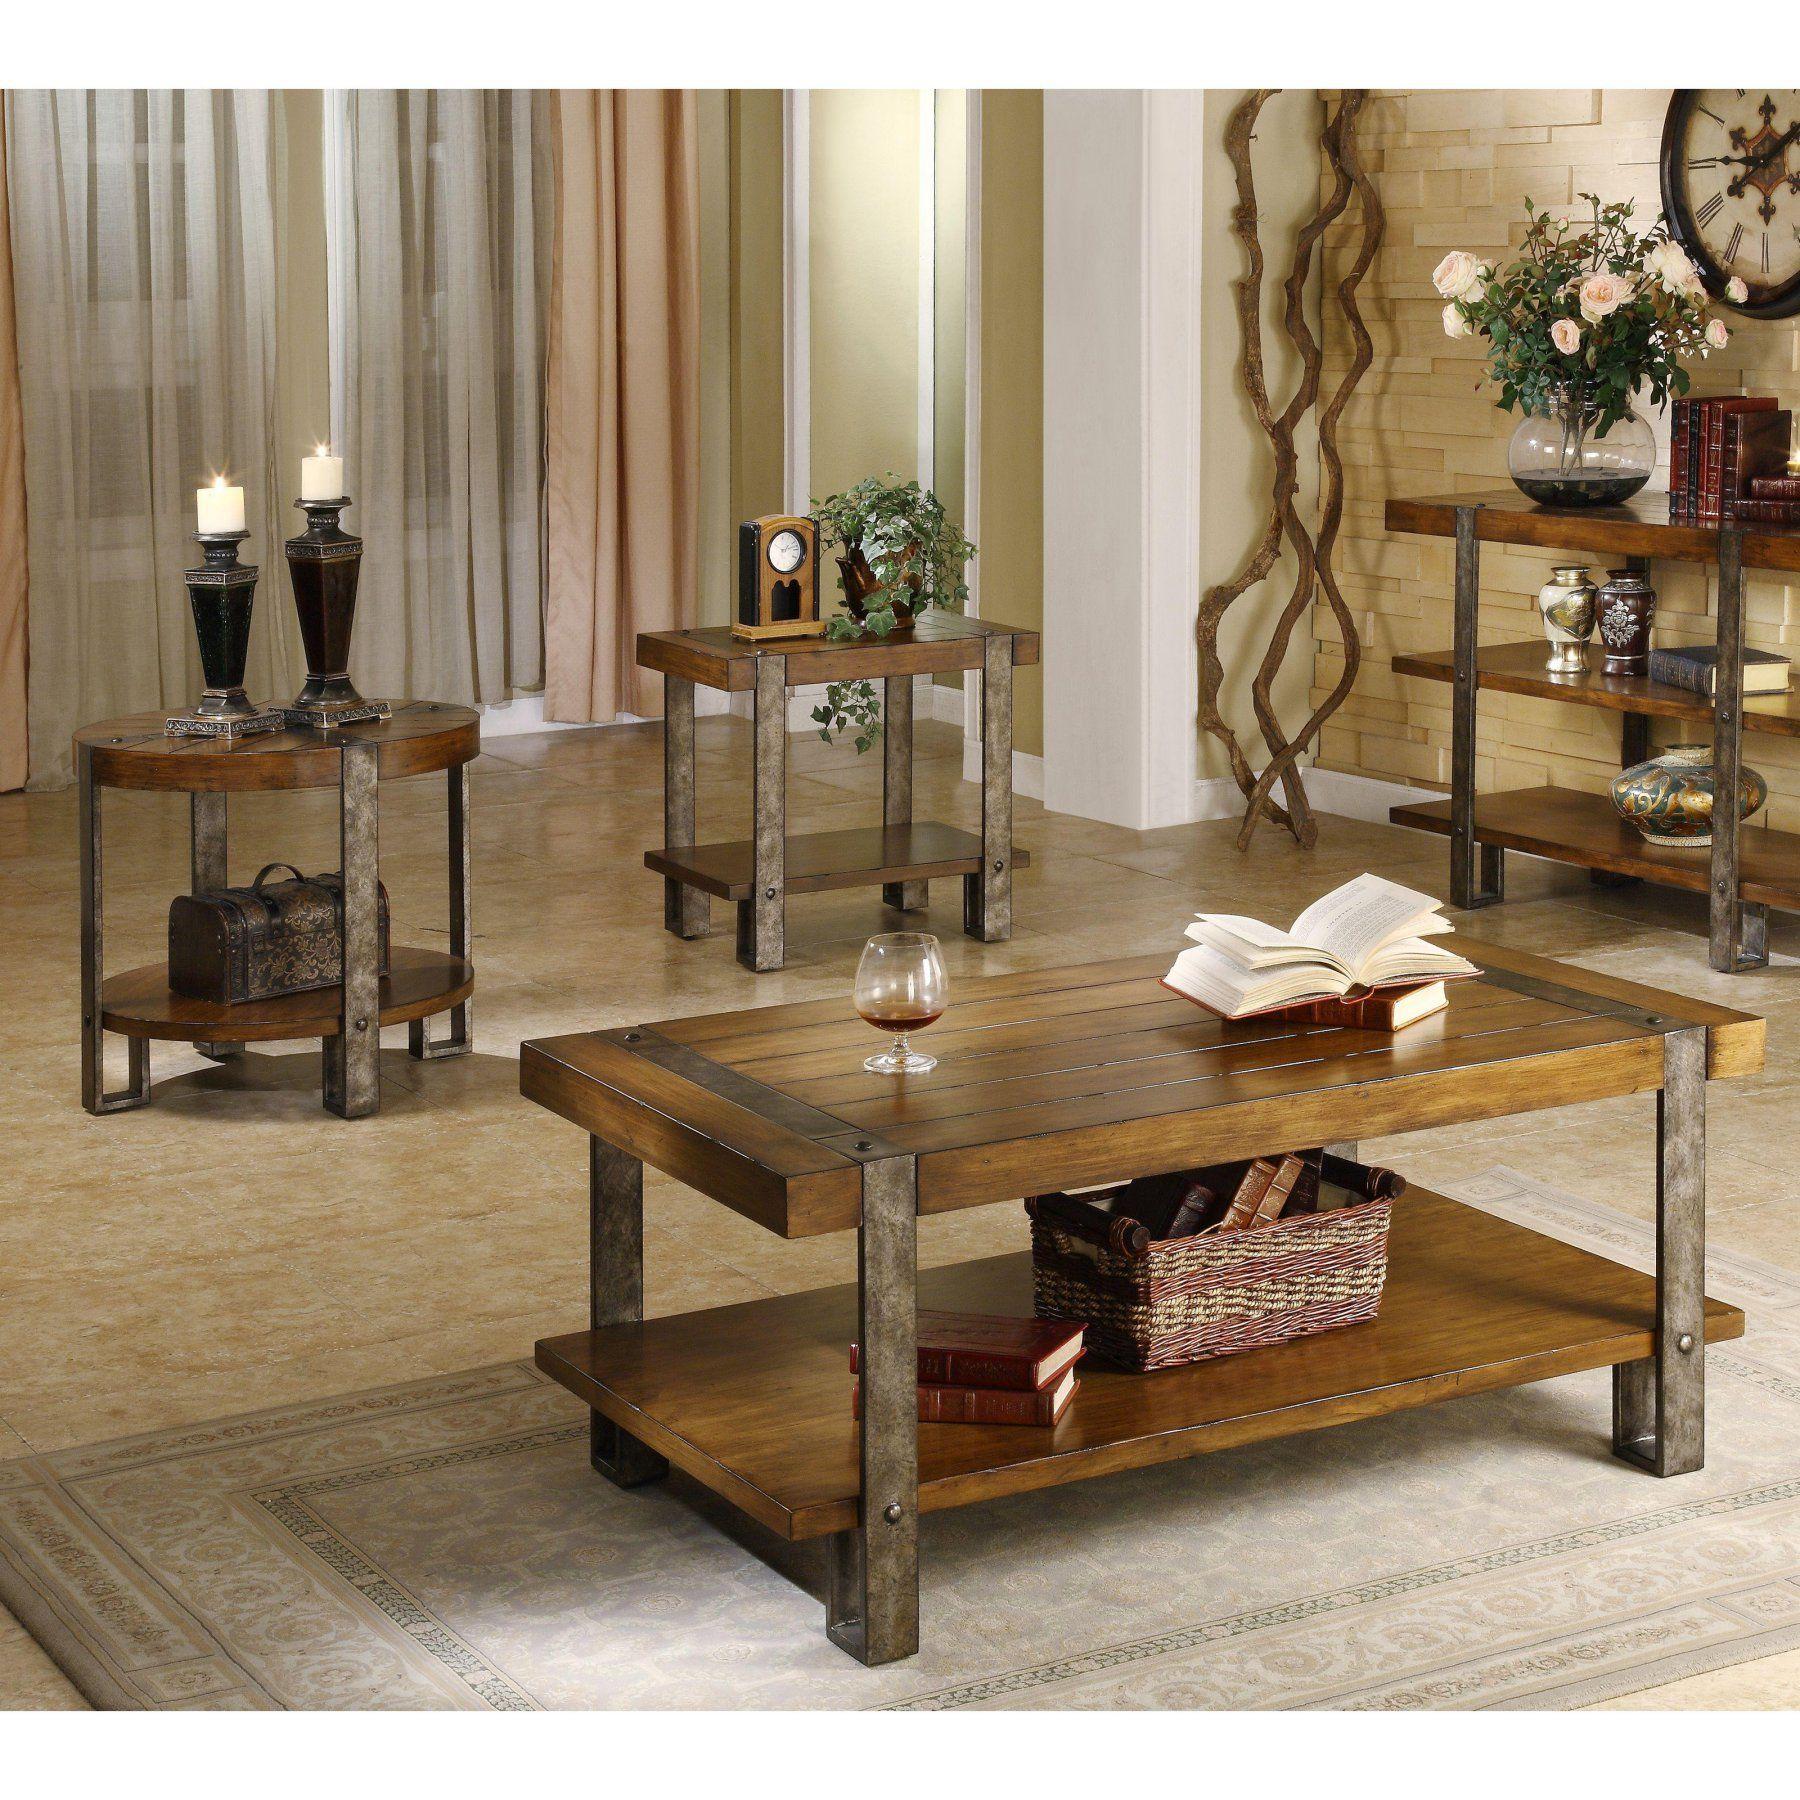 Riverside Sierra Rectangular 3 Piece Coffee Table Set RVS1842